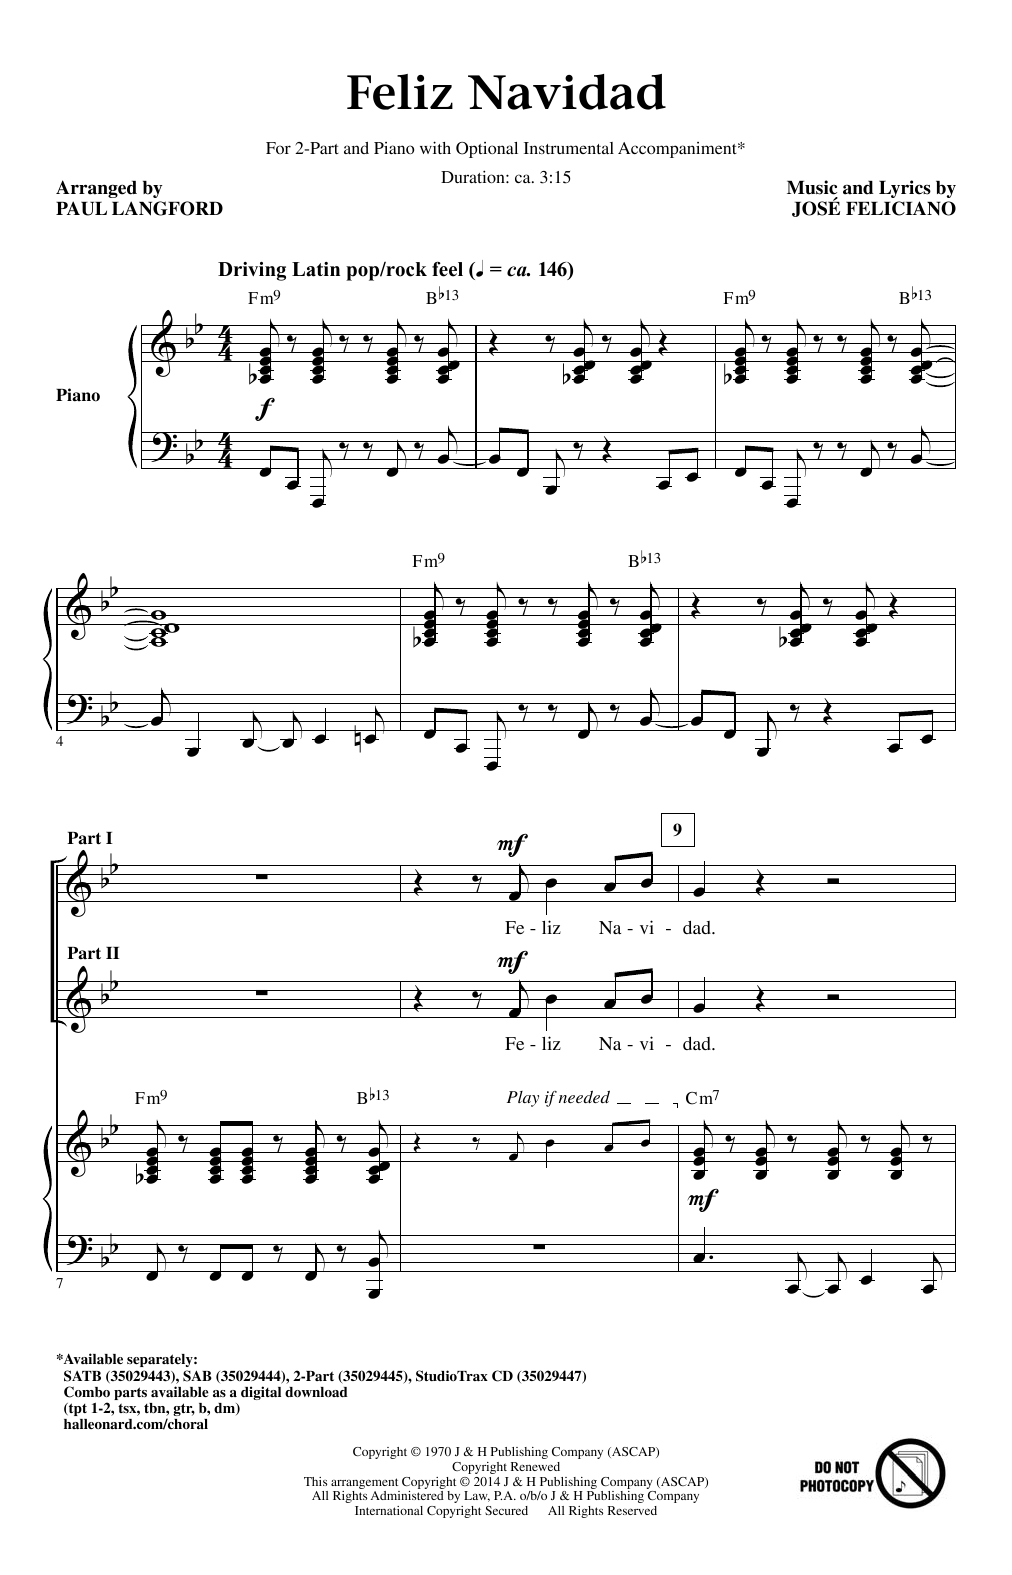 Feliz Navidad (arr. Paul Langford) (2-Part Choir)